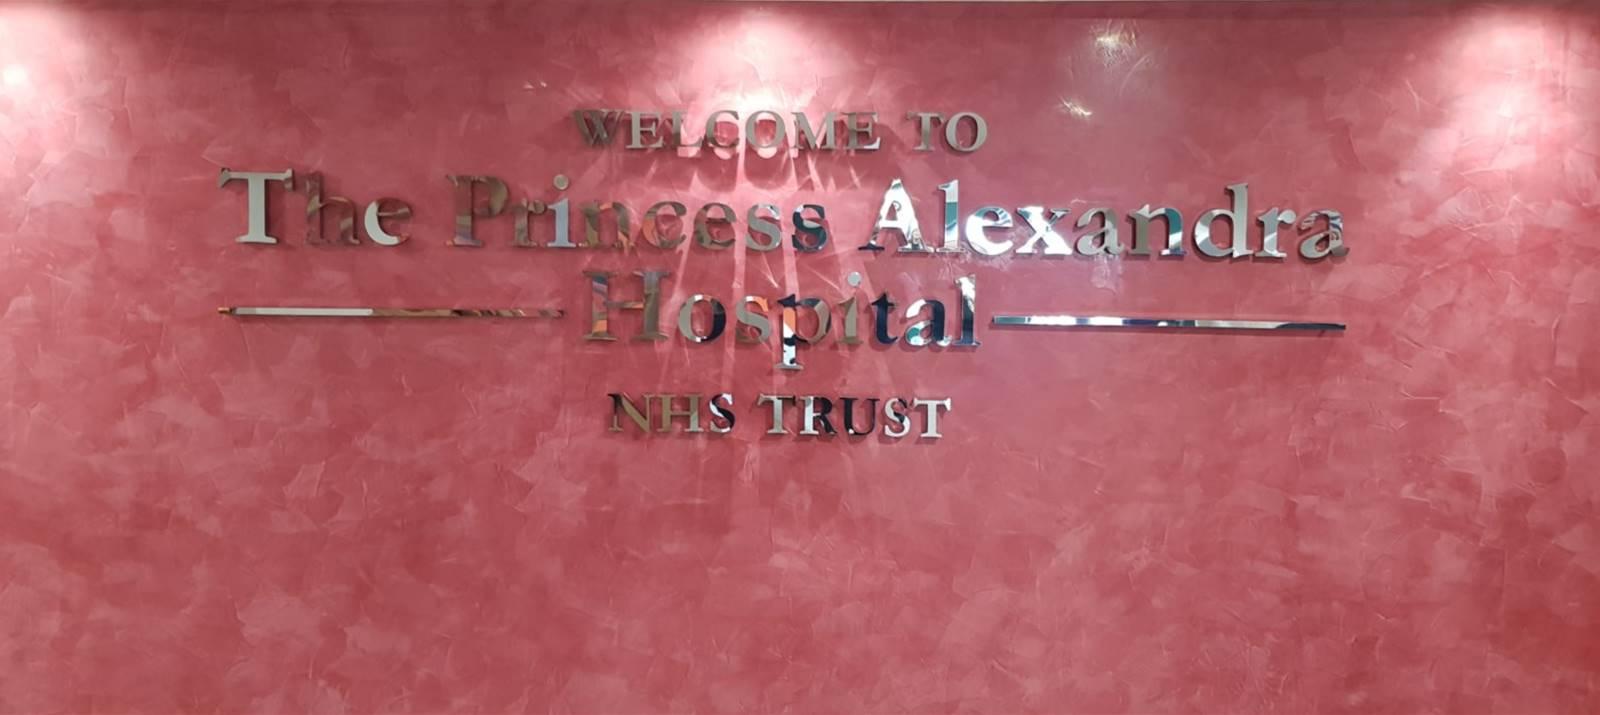 Polished Steel Lettering for hospital entrance lobby